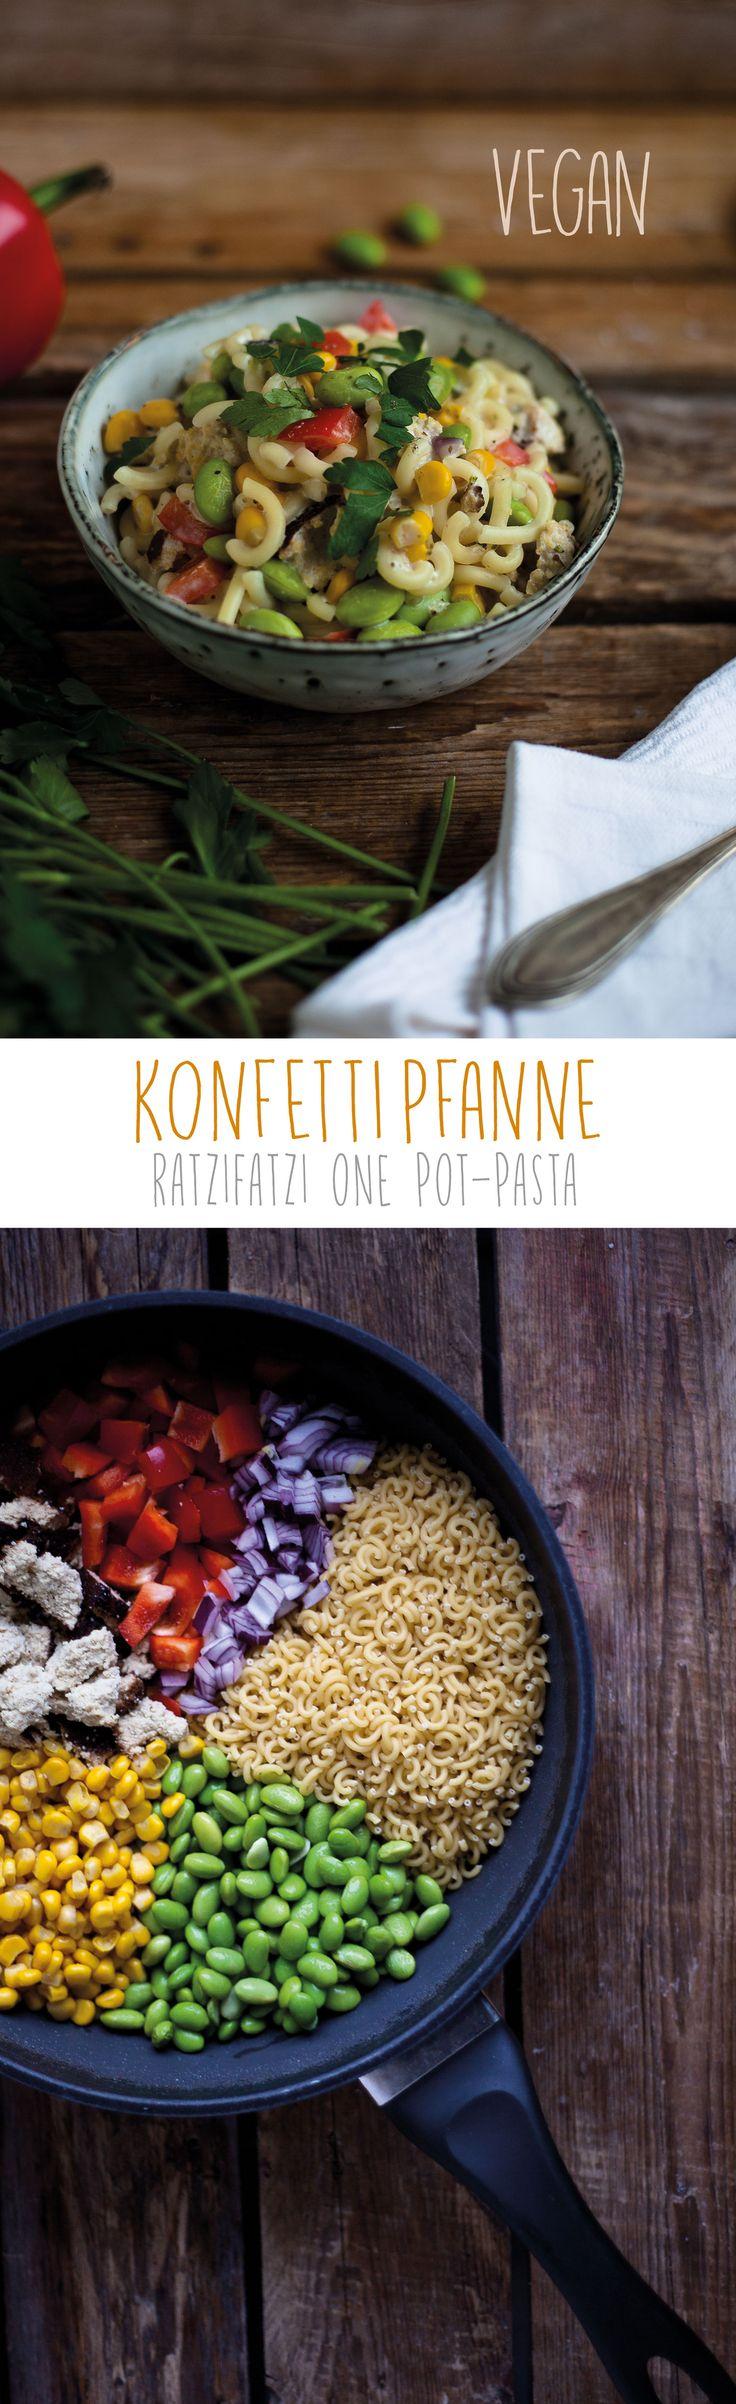 One Pot Pasta Vegan - Entdeckt von Vegalife Rocks: www.vegaliferocks.de✨ I Fleischlos glücklich, fit & Gesund✨ I Follow me for more vegan inspiration @vegaliferocks